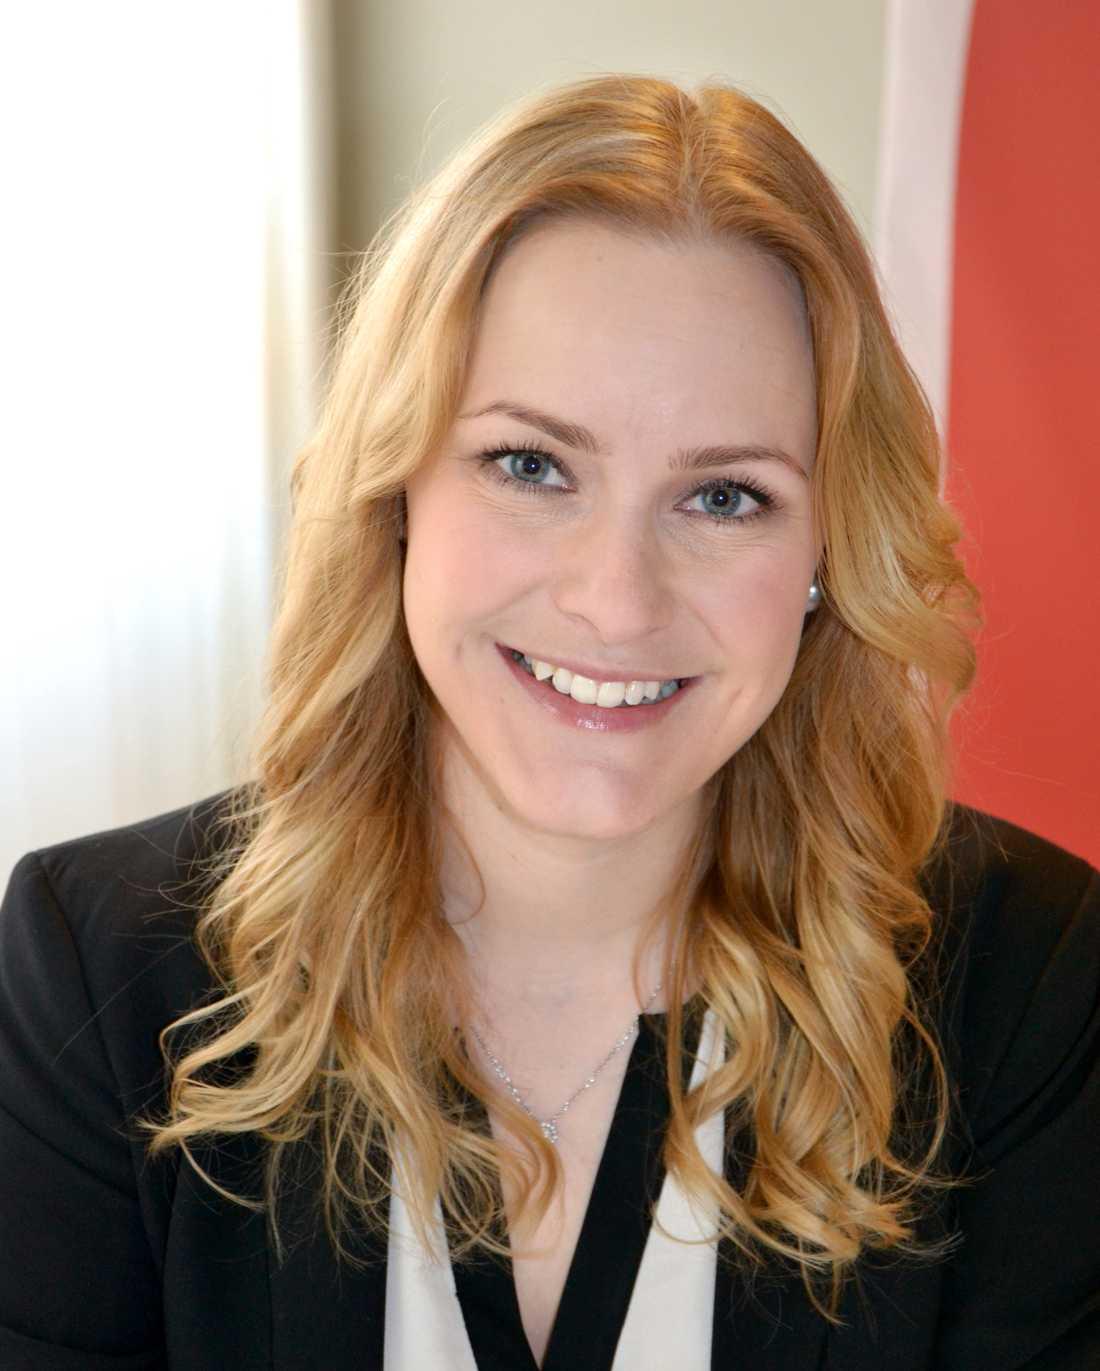 Heidi Wold, kommunikationsansvarig på Scandic.